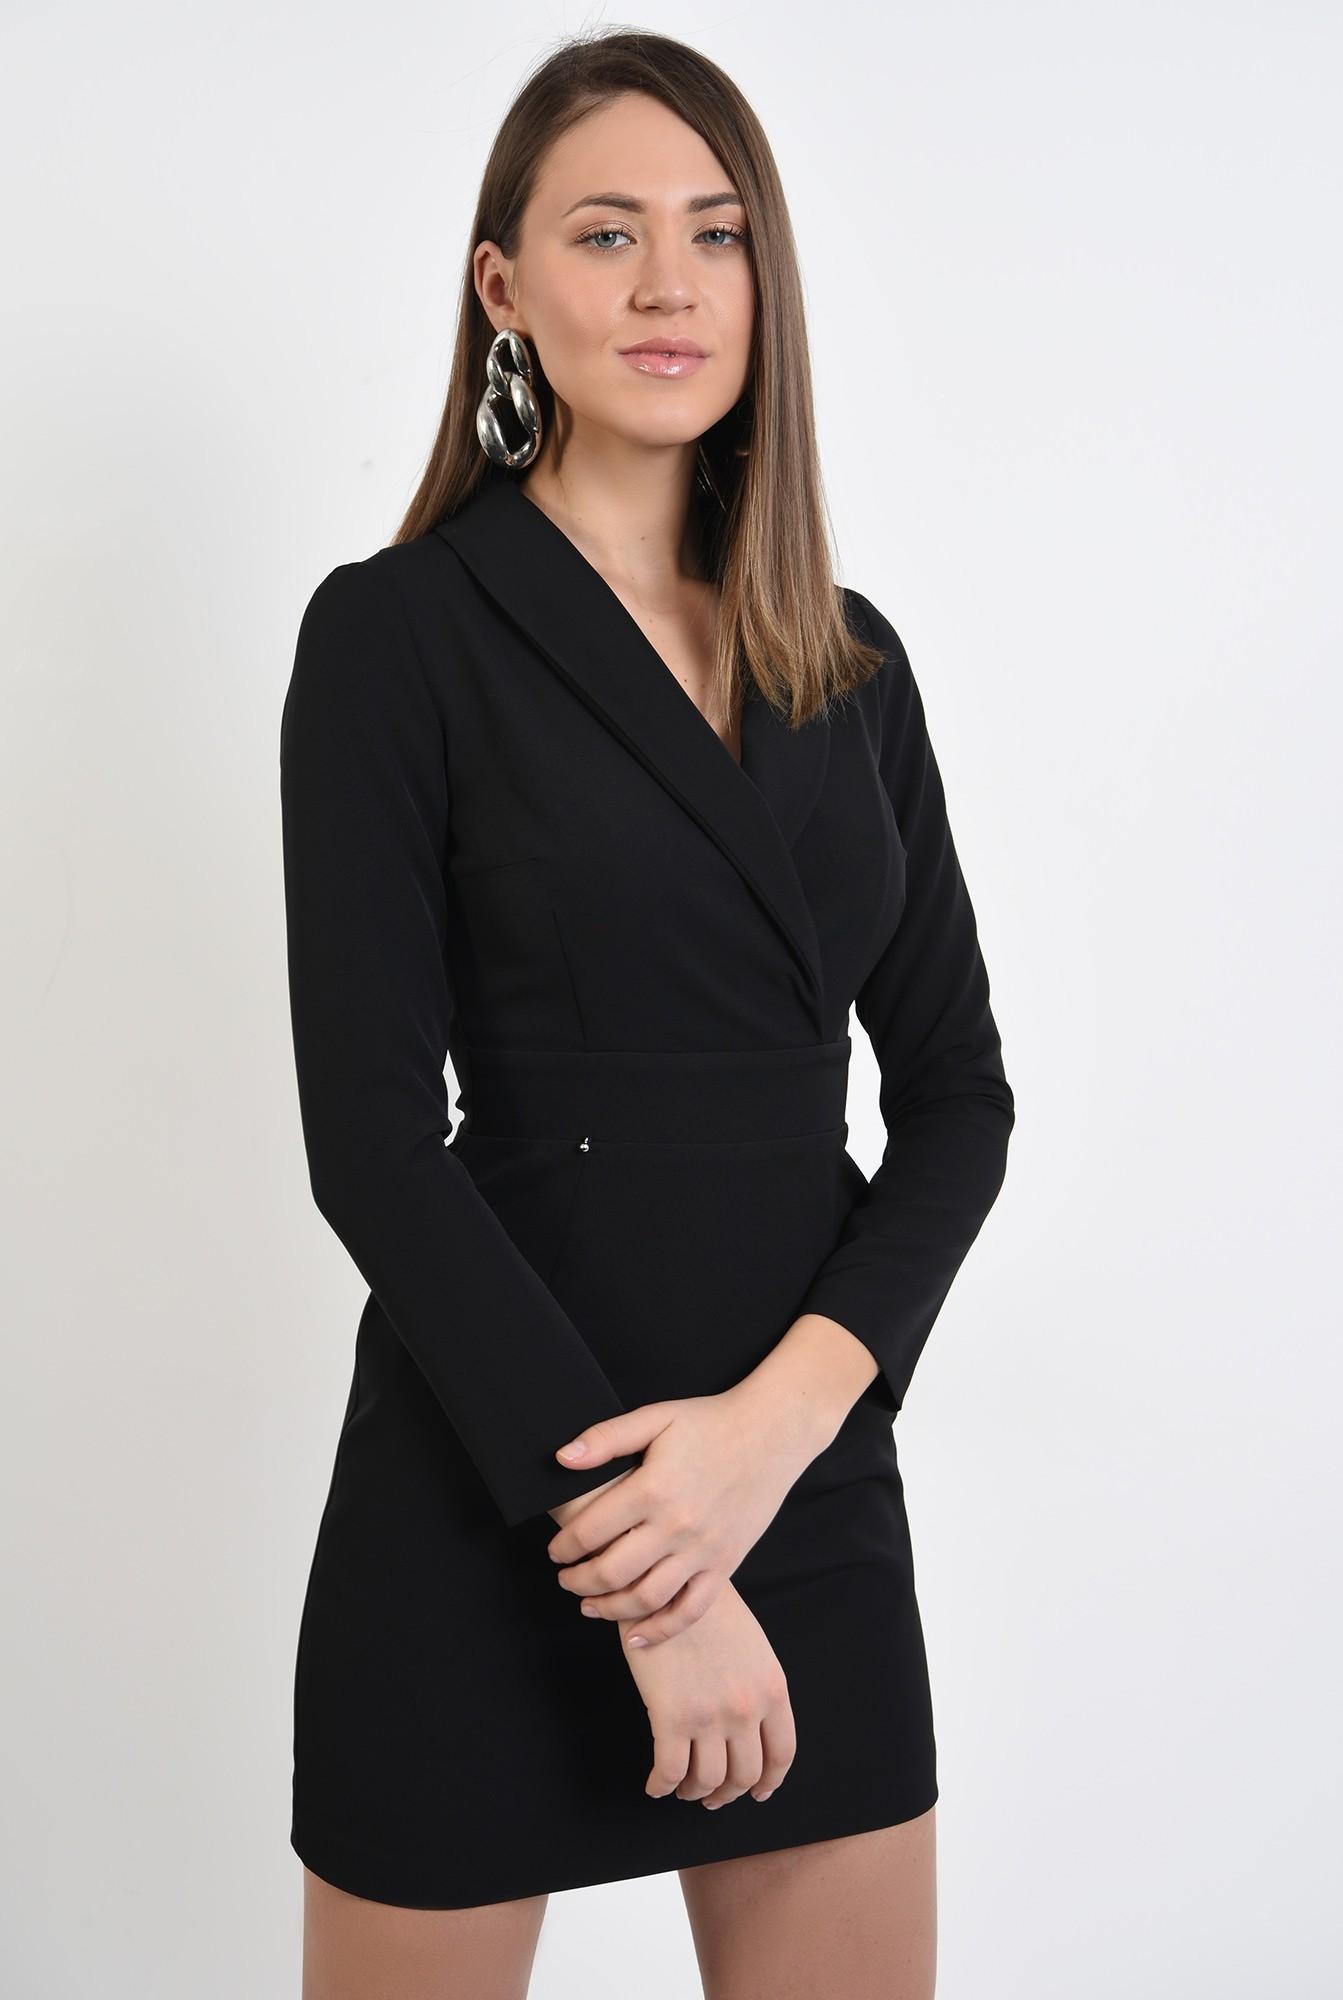 2 - rochie mini, neagra, cu revere, scurta, maneci ajustate, Poema